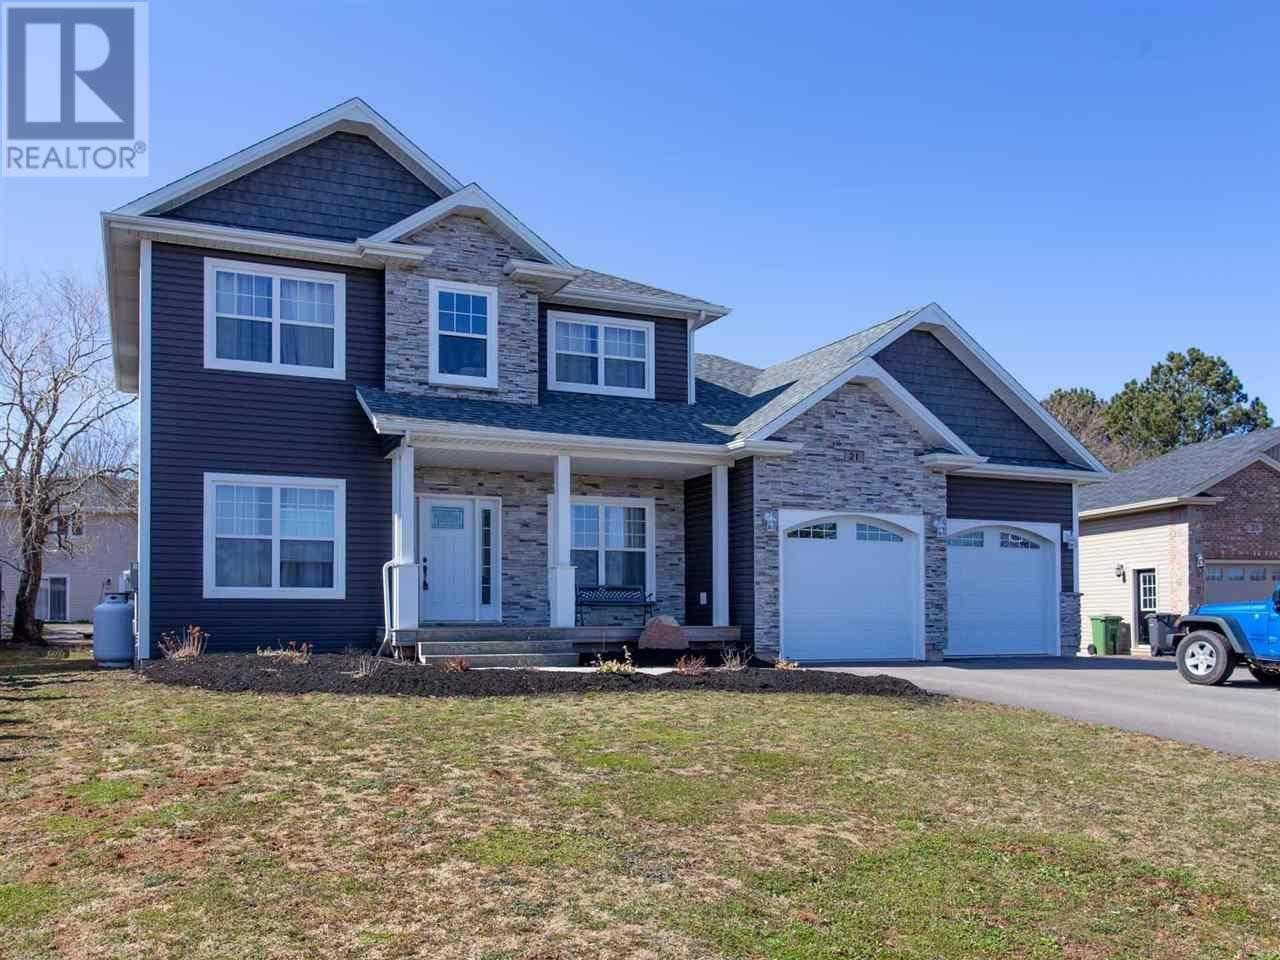 House for sale at 21 Macarthur Dr Sherwood Prince Edward Island - MLS: 202001074